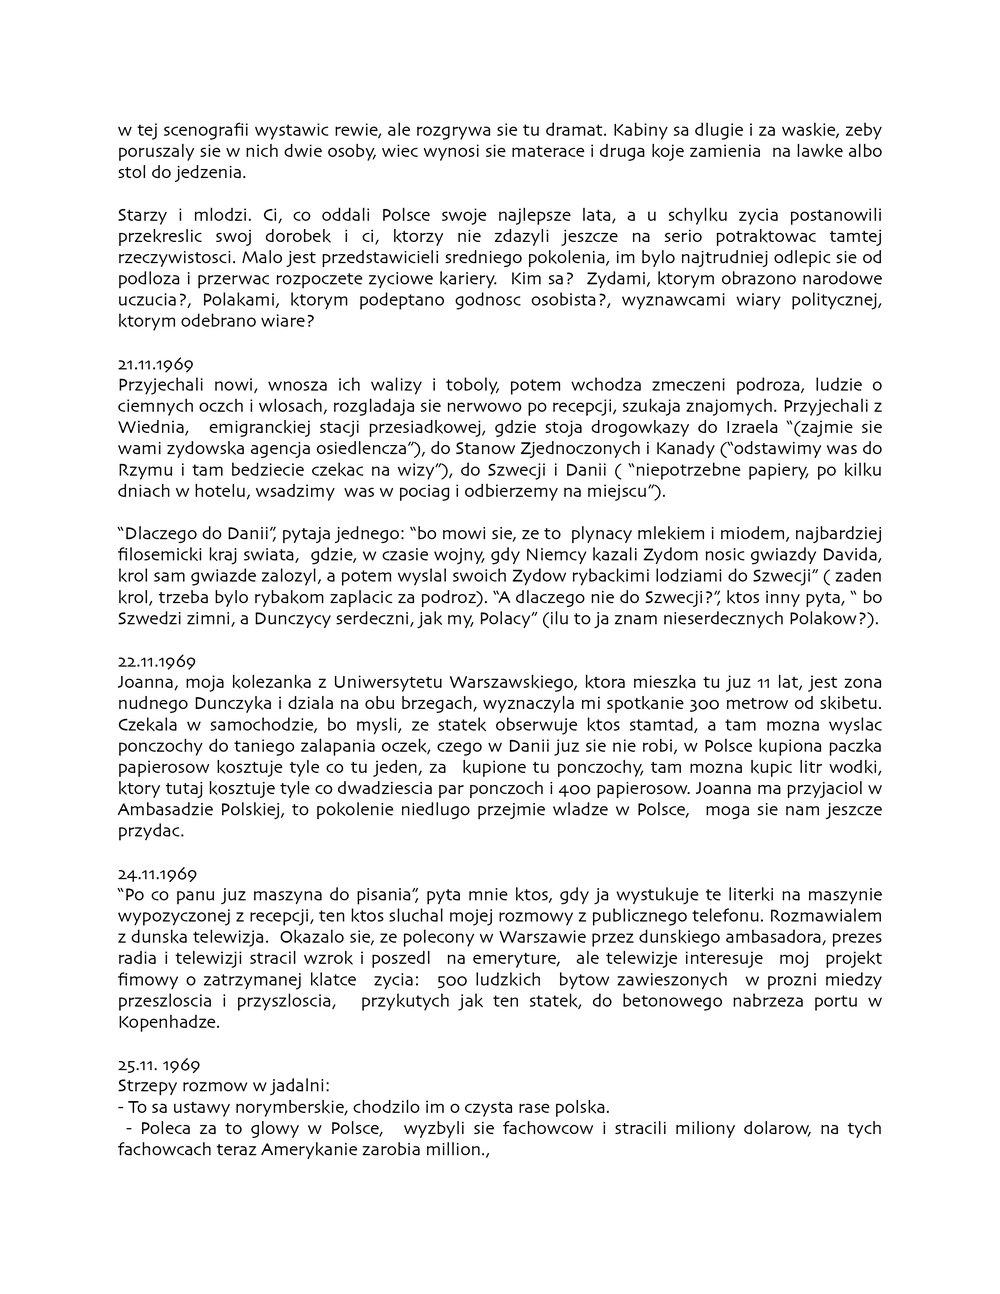 SKIBET-The-Director's-Polish-Diary-2.jpg